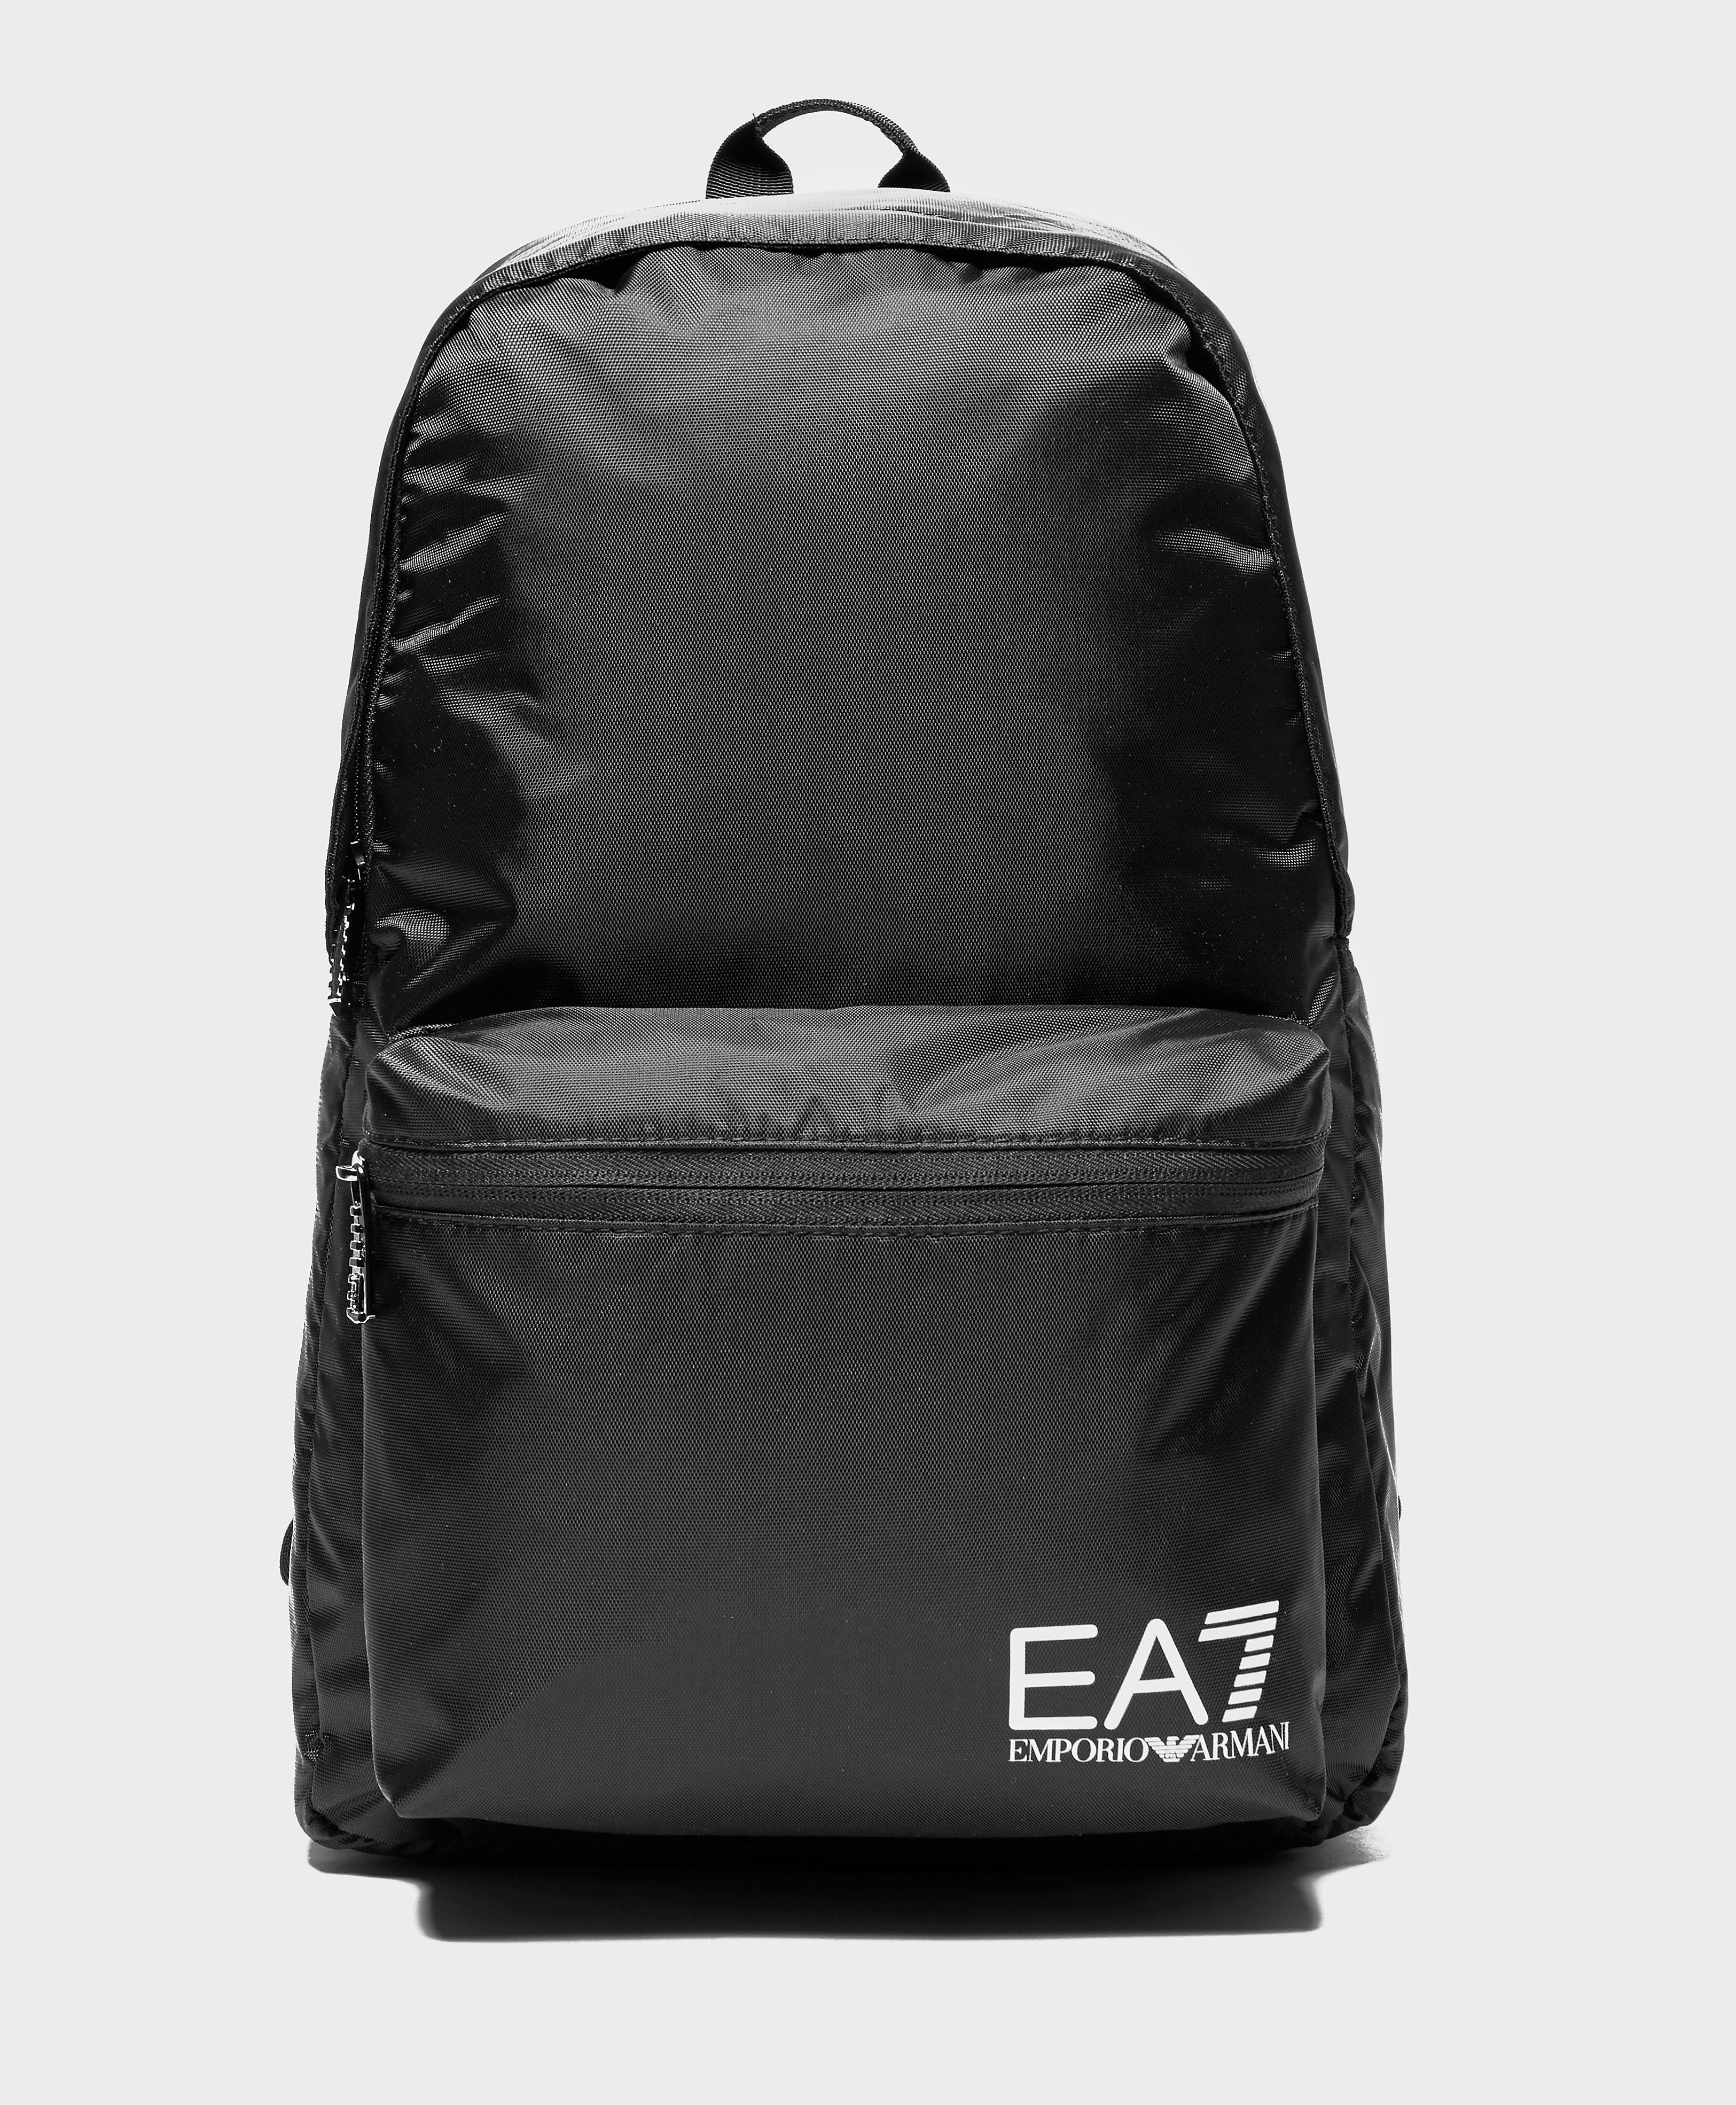 Emporio Armani EA7 TRN Core Backpack  Black Black